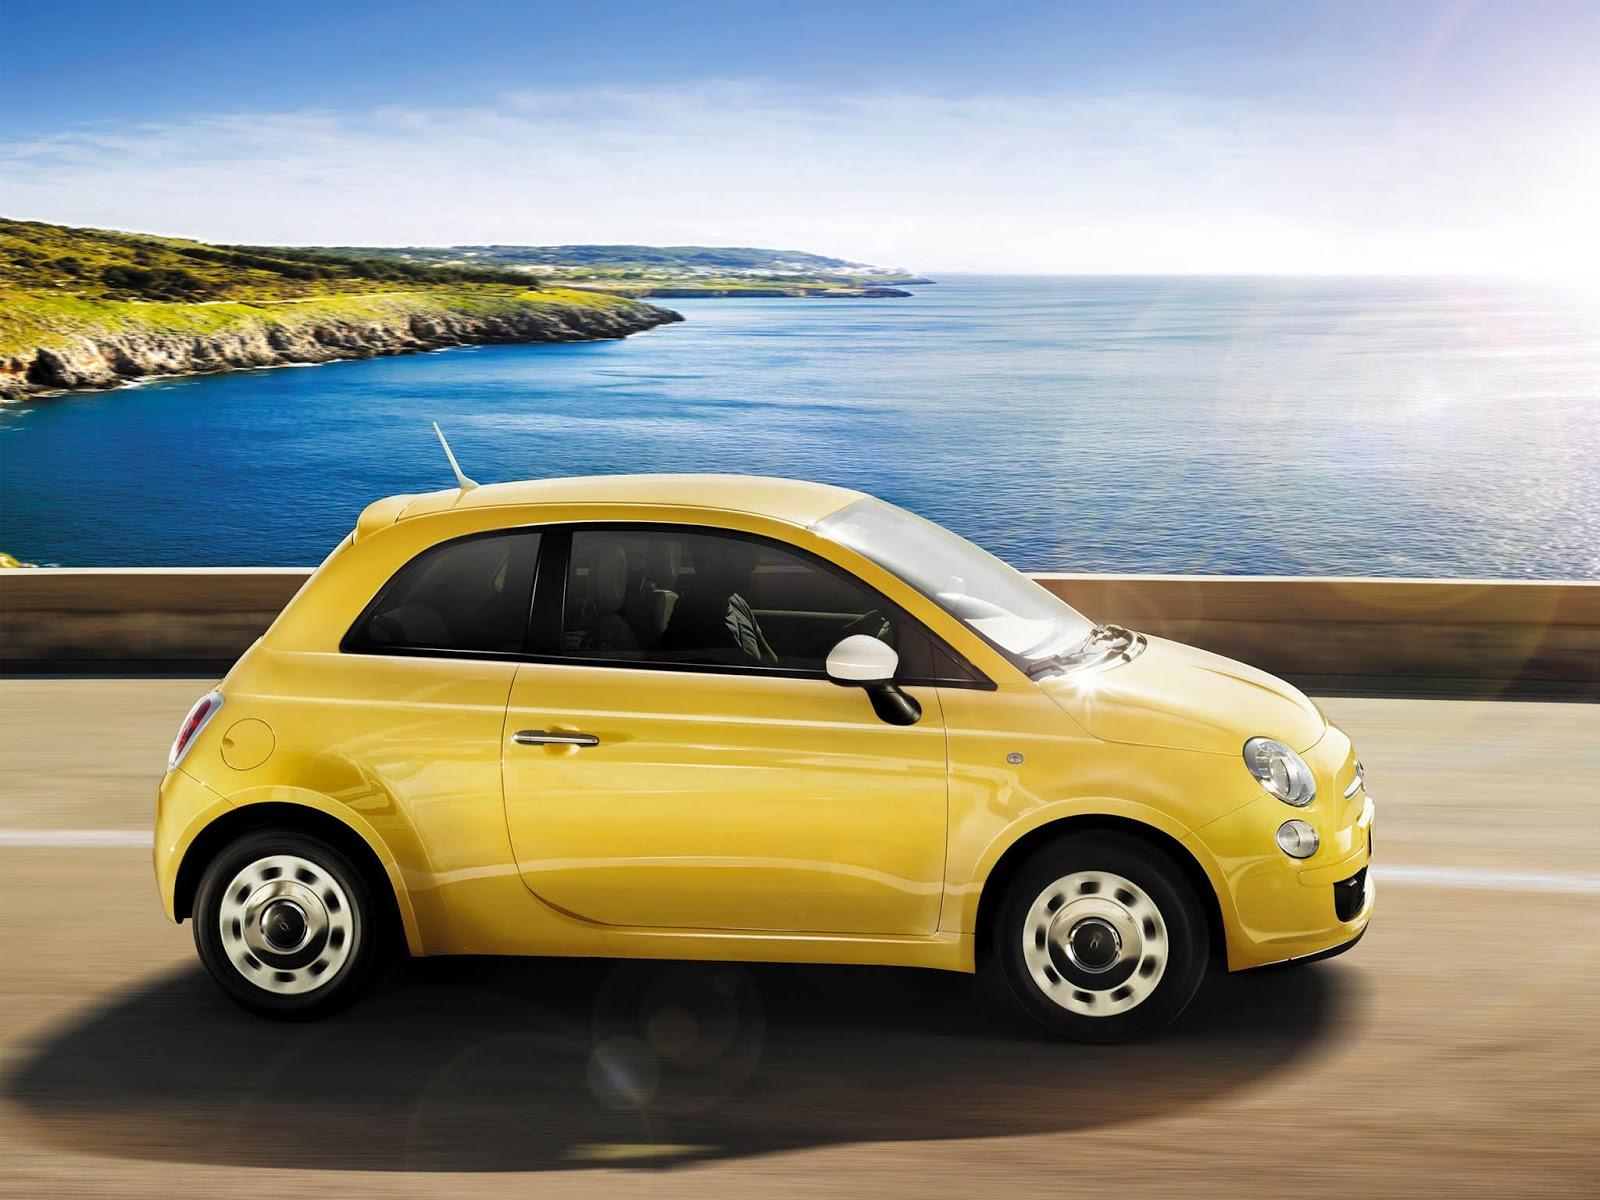 Summer2BCheck2BUp2B25CE25B325CE25B925CE25B12BFiat252C2BFiat2BProfessional252C2BAlfa2BRomeo Δωρεάν καλοκαιρινός έλεγχος για Fiat, Fiat Professional, Alfa Romeo και Abarth